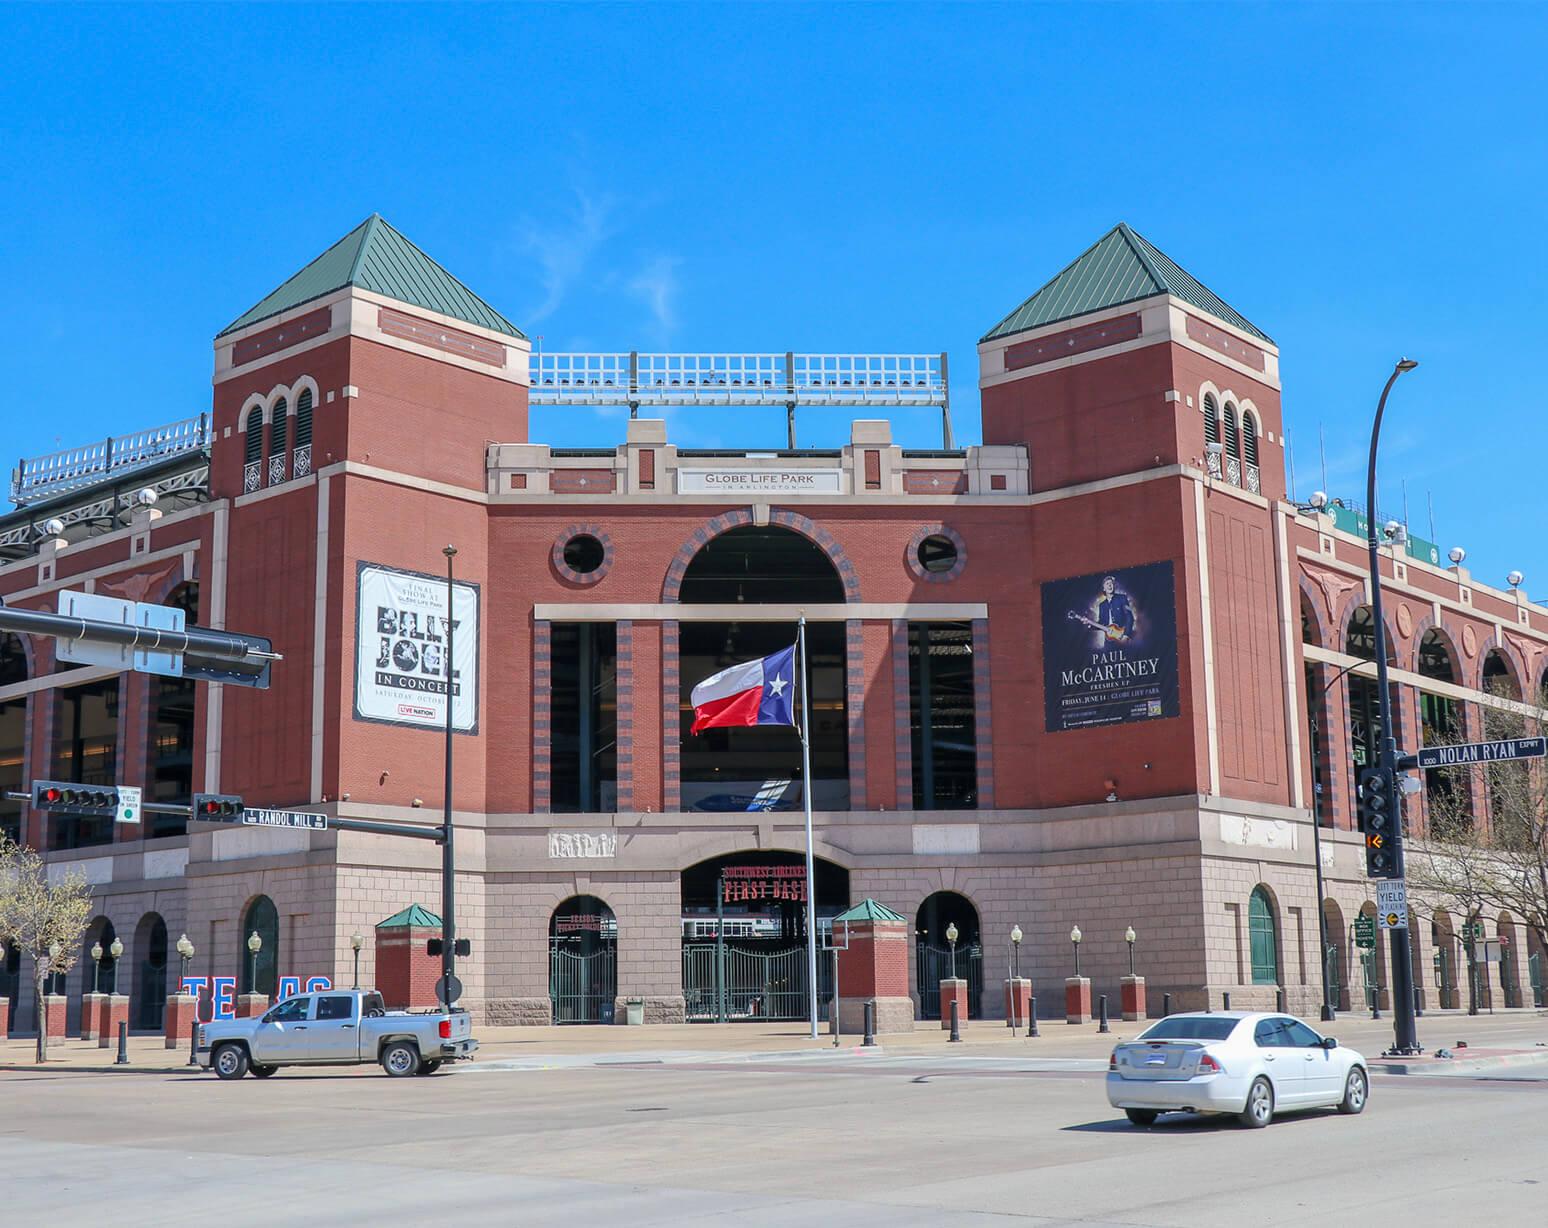 Where do the Texas Rangers play baseball?